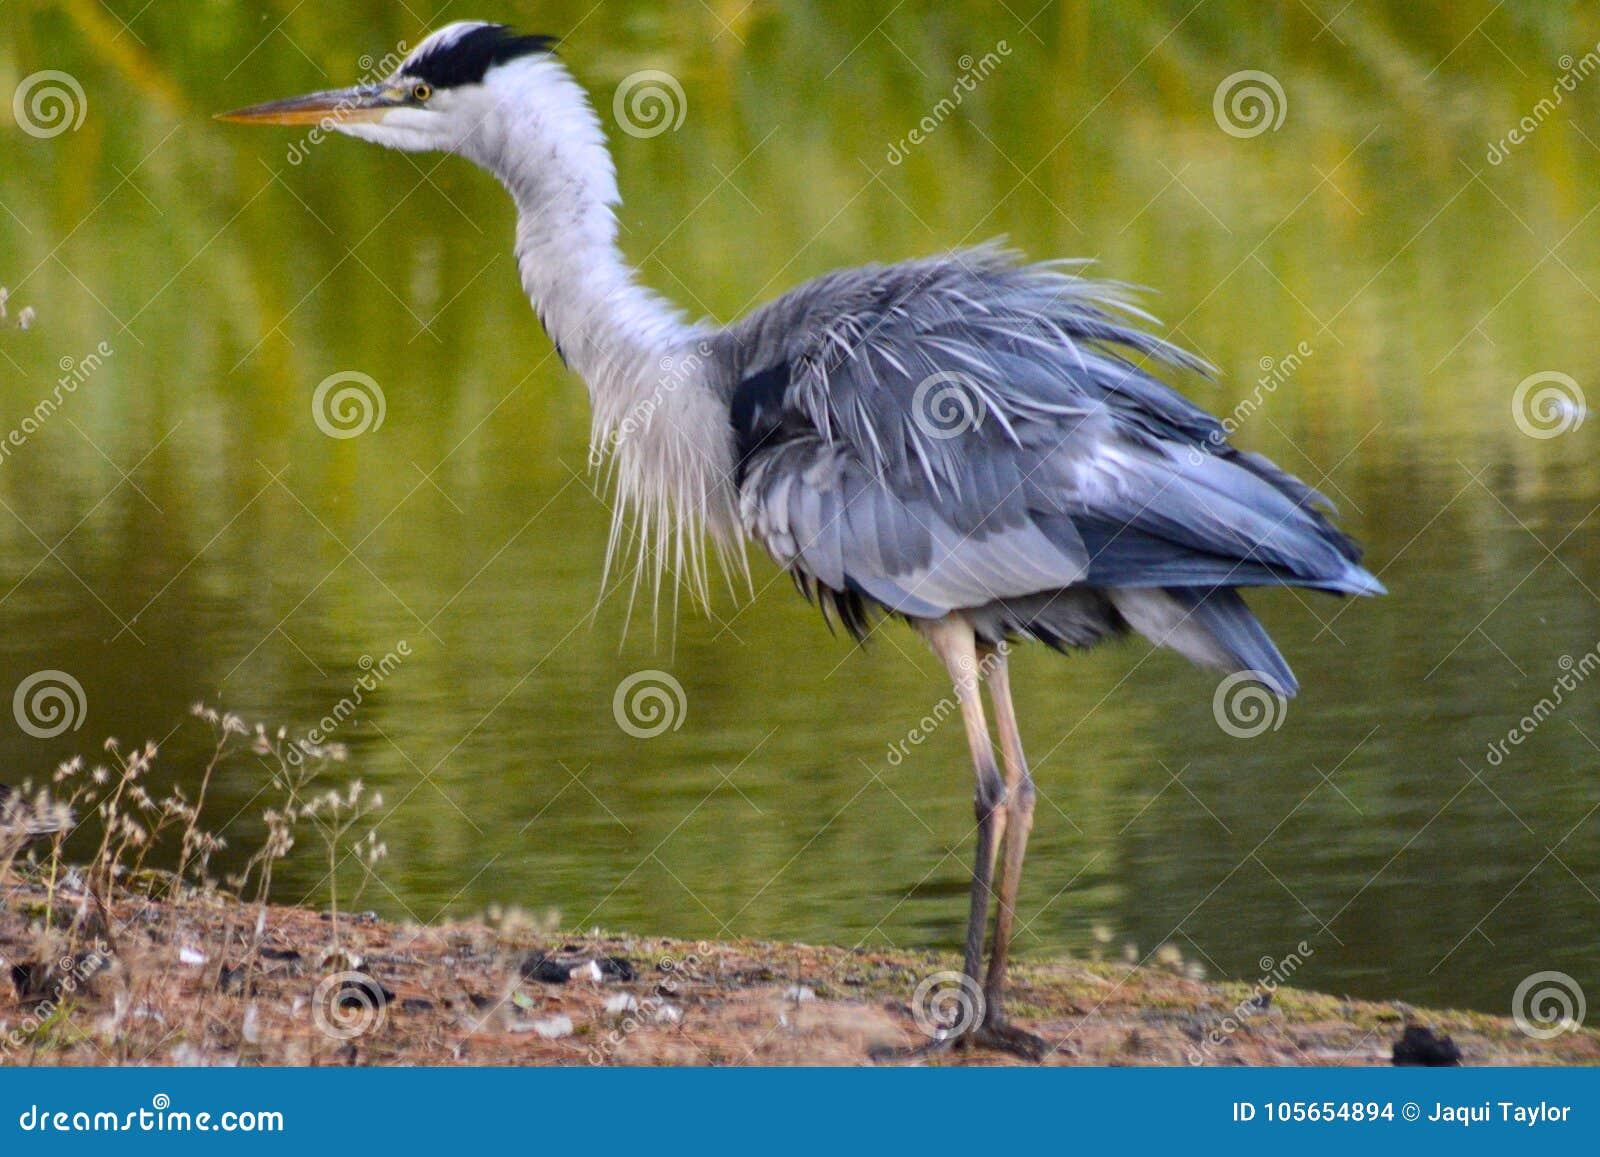 A heron on the Ornamental Pond, Southampton Common